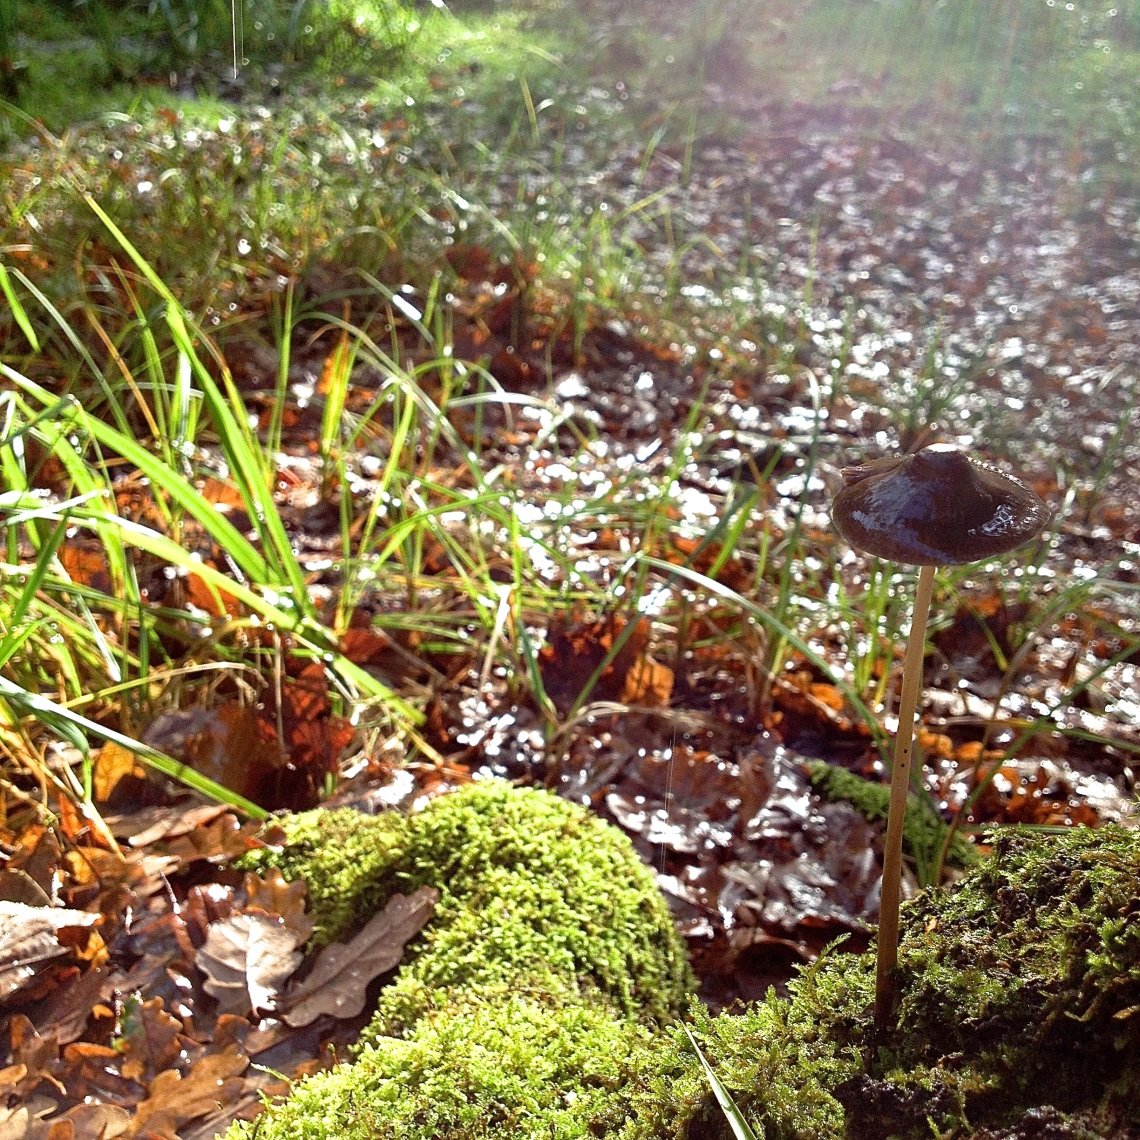 Cueillette sauvage champignon 27